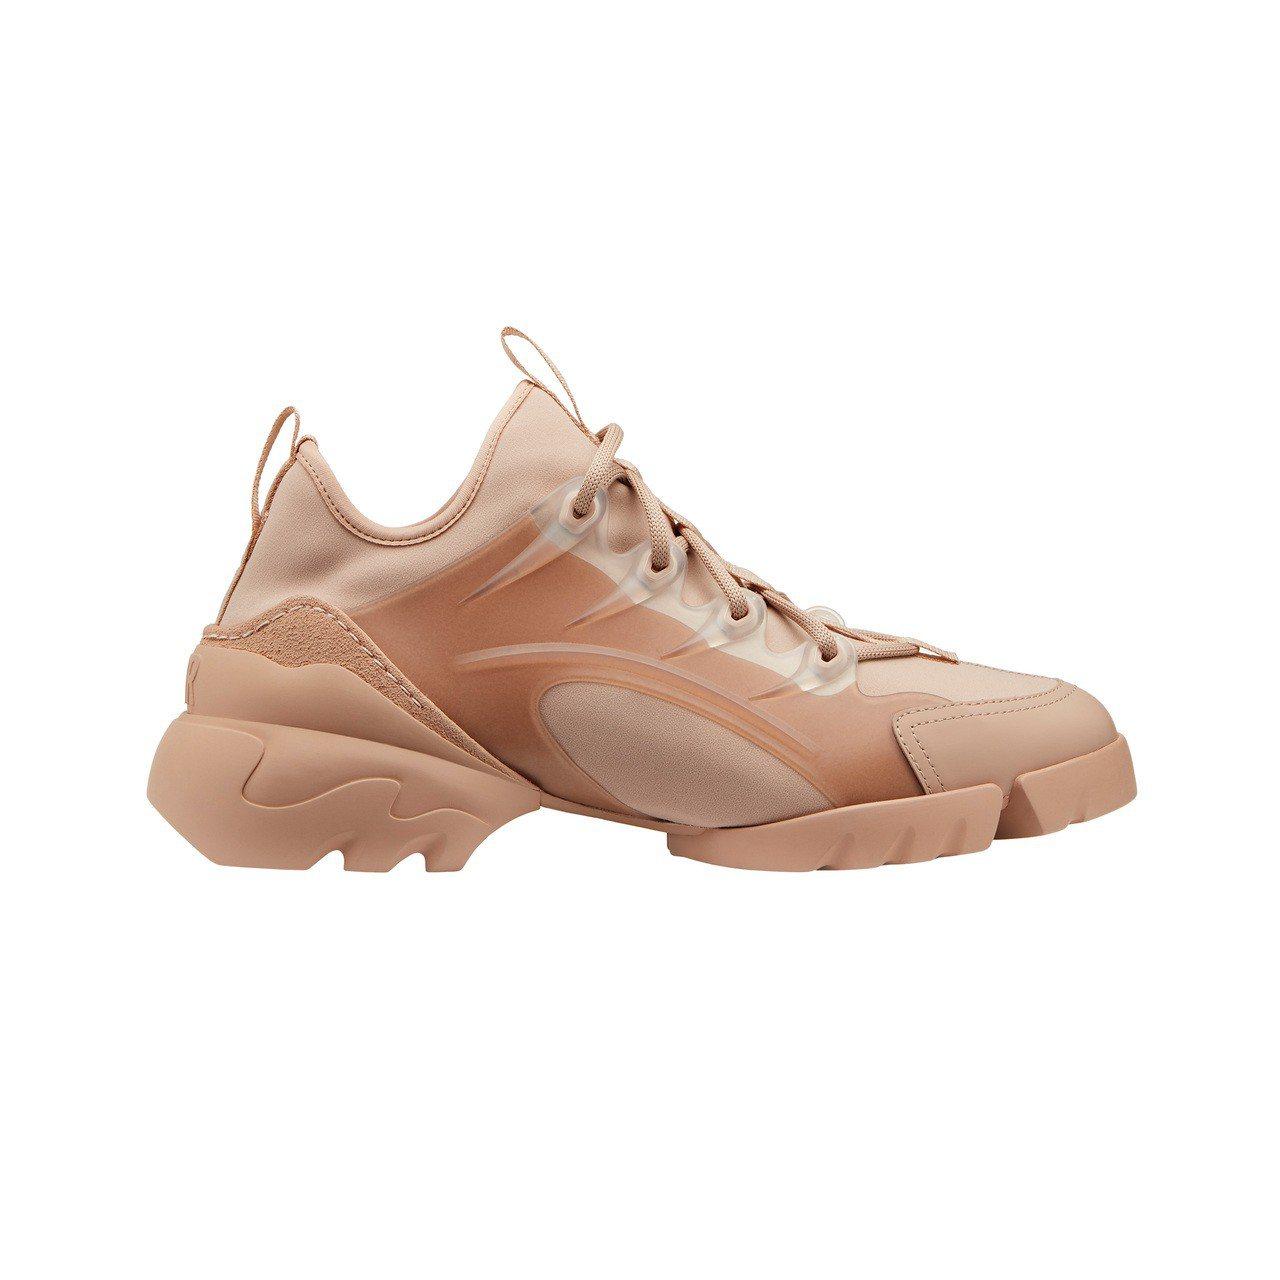 Dior D-Connect粉膚色橡膠球鞋、34,000元。圖/Dior提供